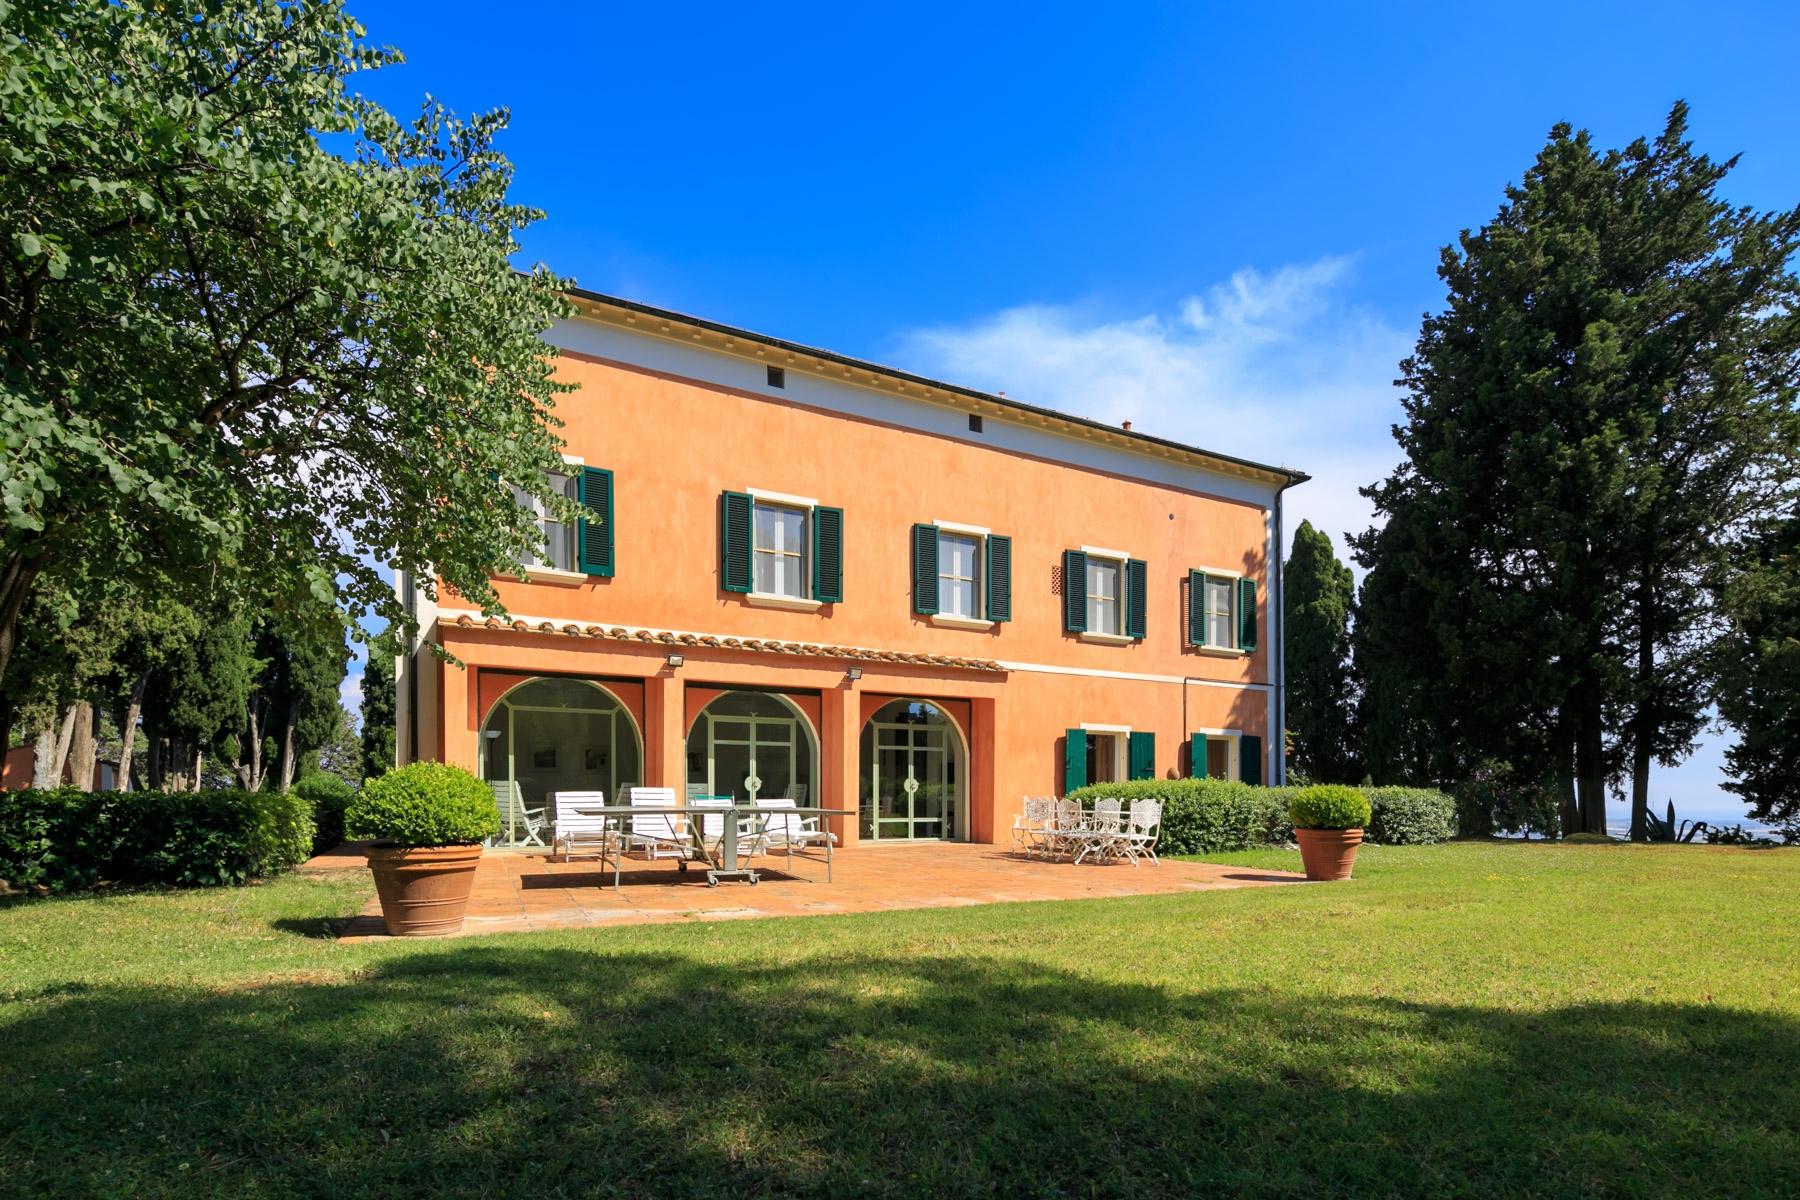 Villa in Vendita a Campiglia Marittima: 5 locali, 1100 mq - Foto 20